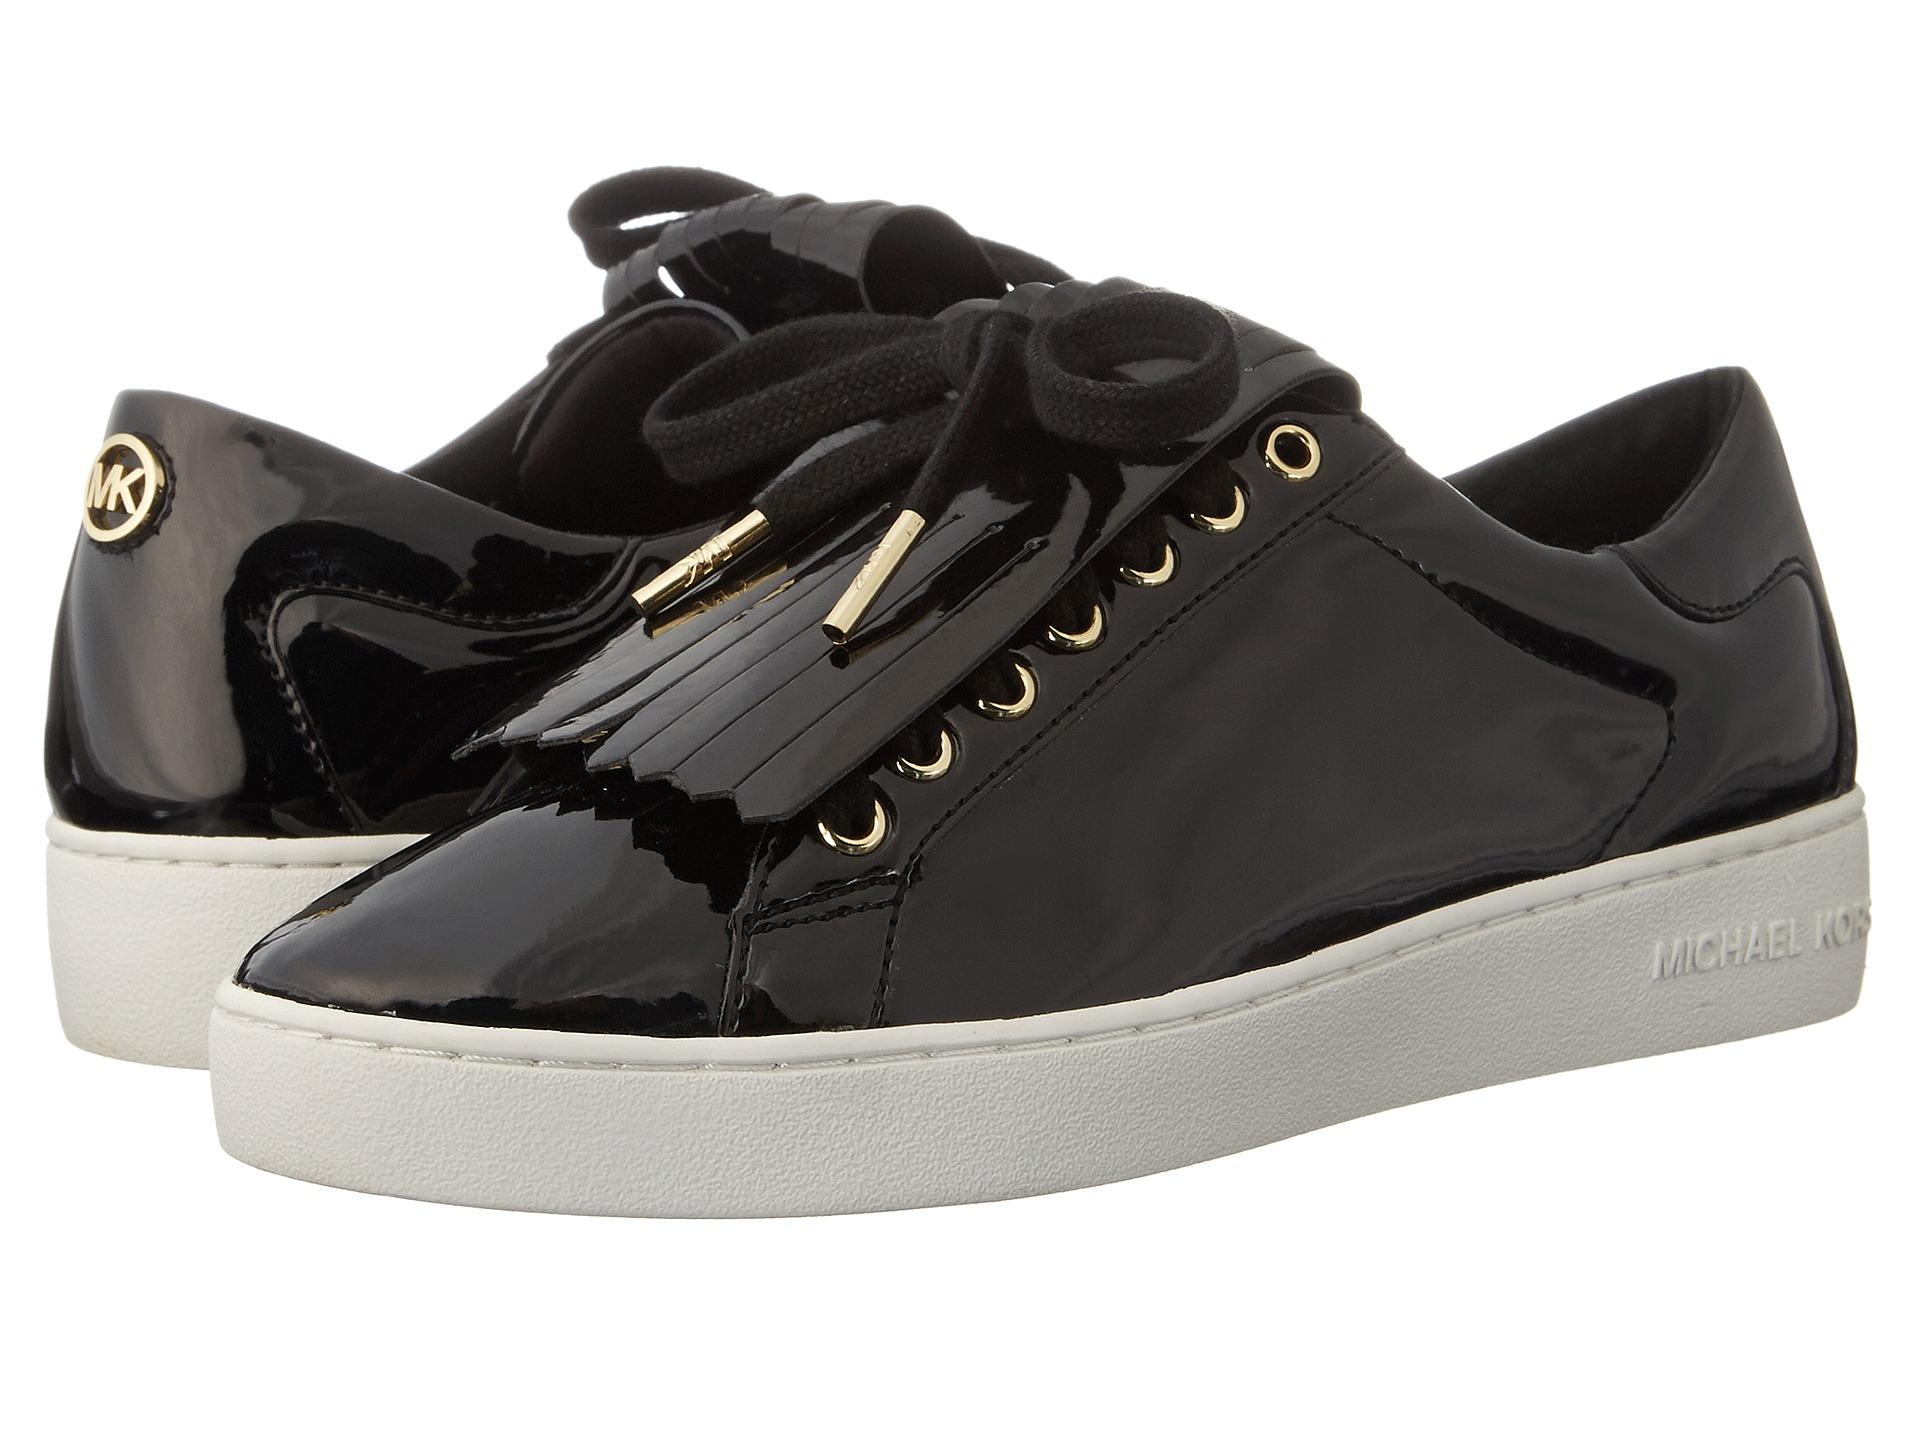 michael michael kors keaton kiltie sneaker black patent free shipping both ways. Black Bedroom Furniture Sets. Home Design Ideas